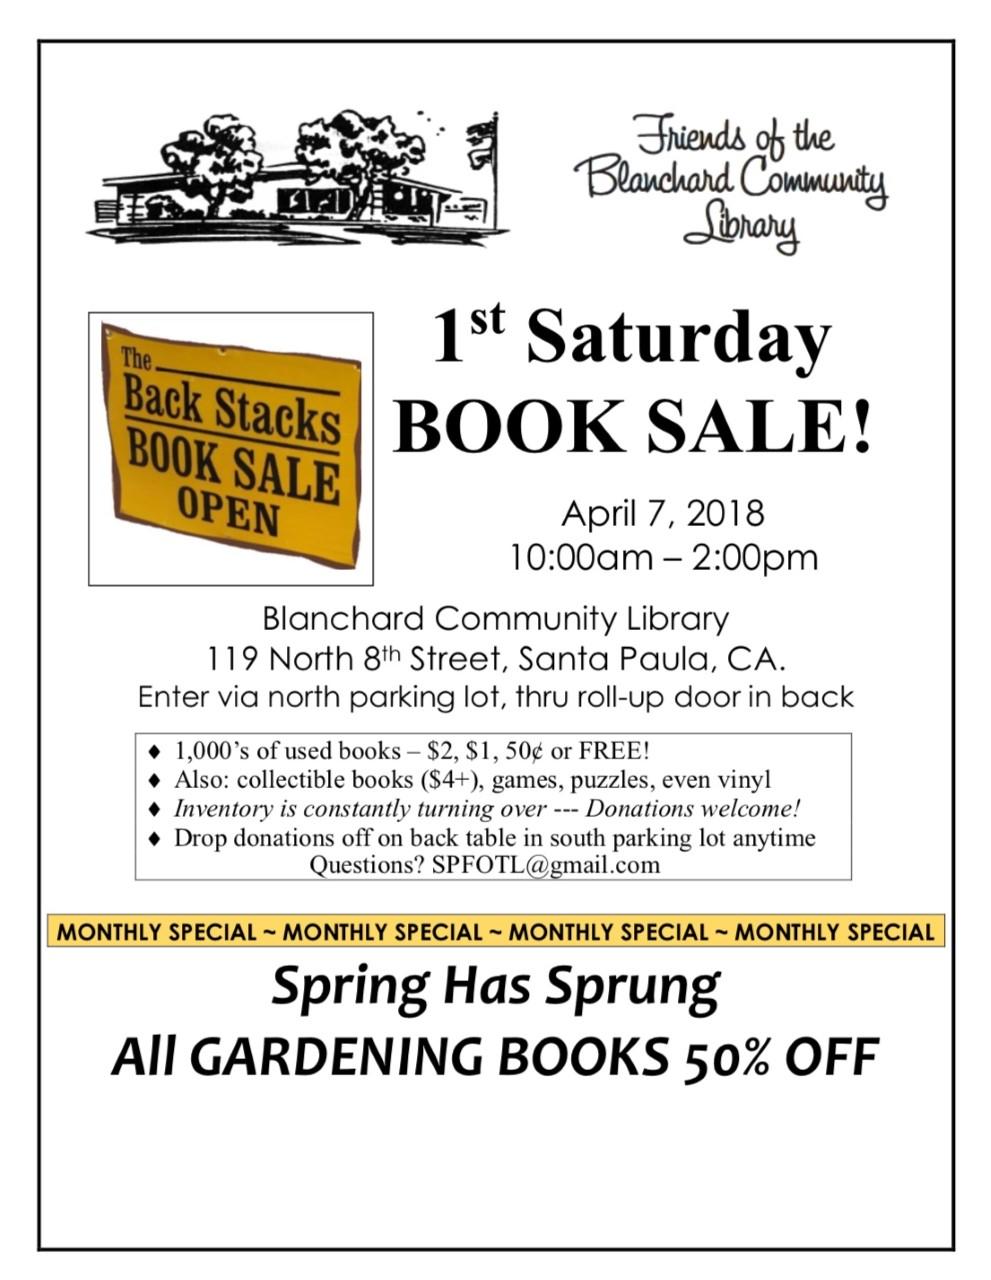 1st Saturday Book Sale Sat April 7, 2018.jpg